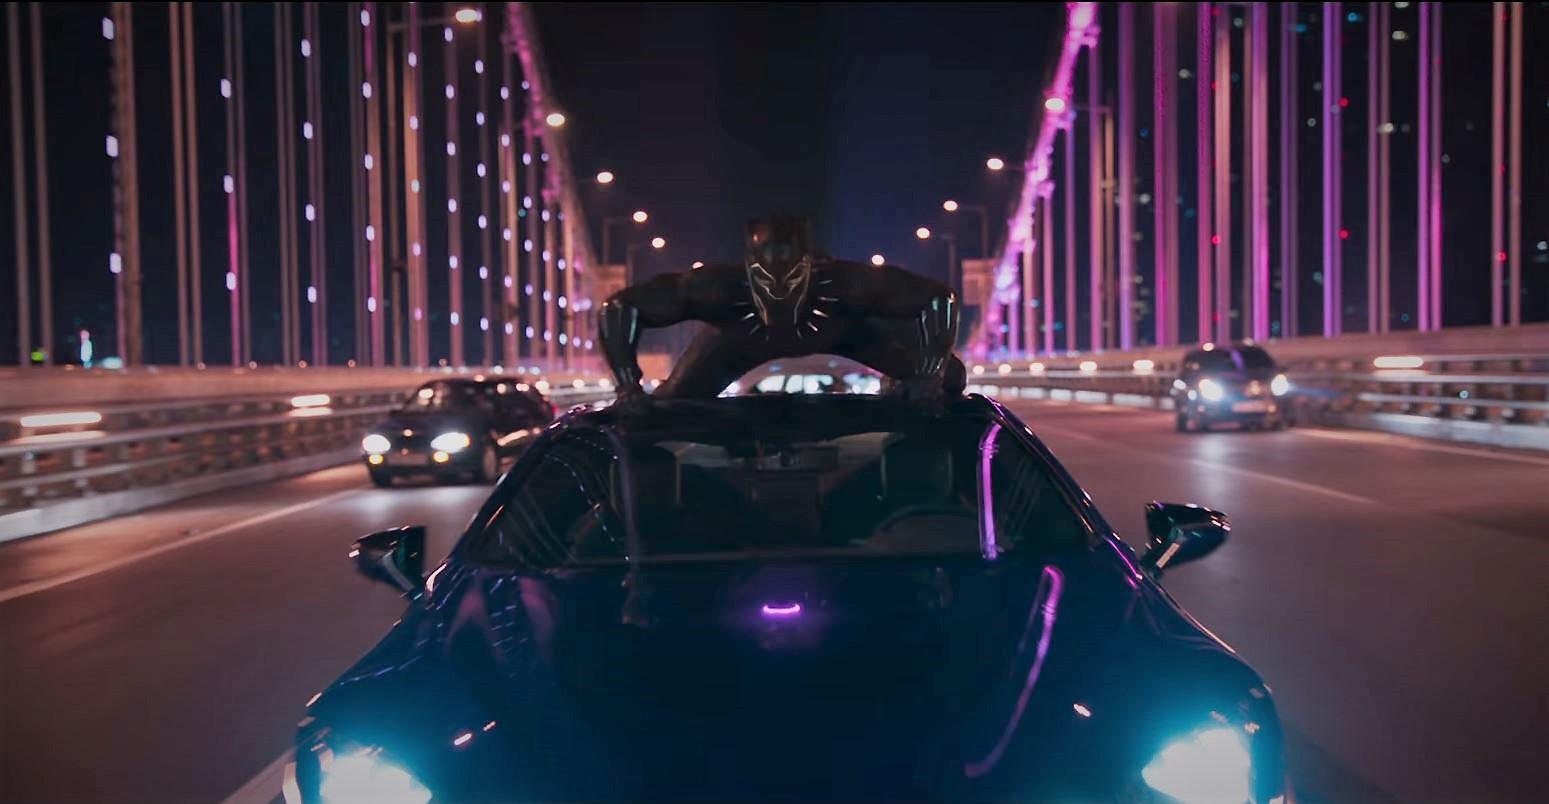 Marvel Black Panther Movie Superhero Car Vehicle Chase Sponsor Brand Lexus